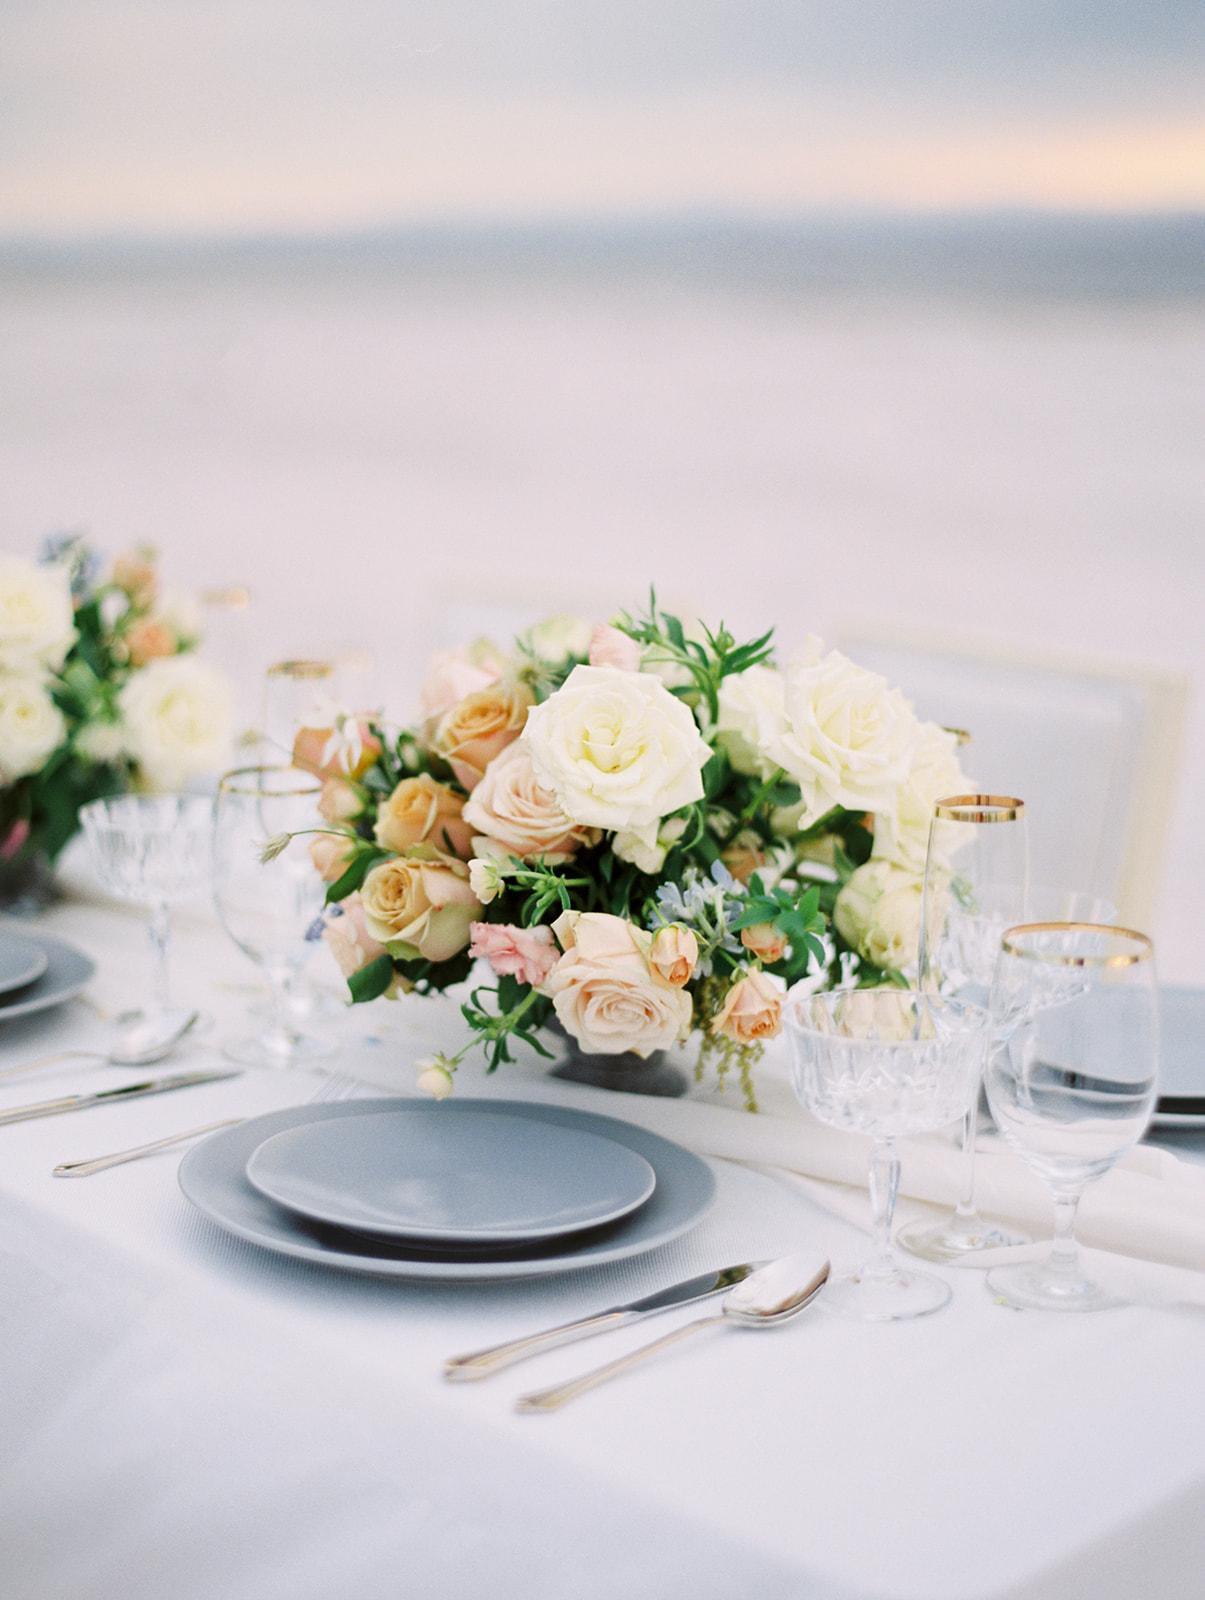 Timeless wedding centerpieces